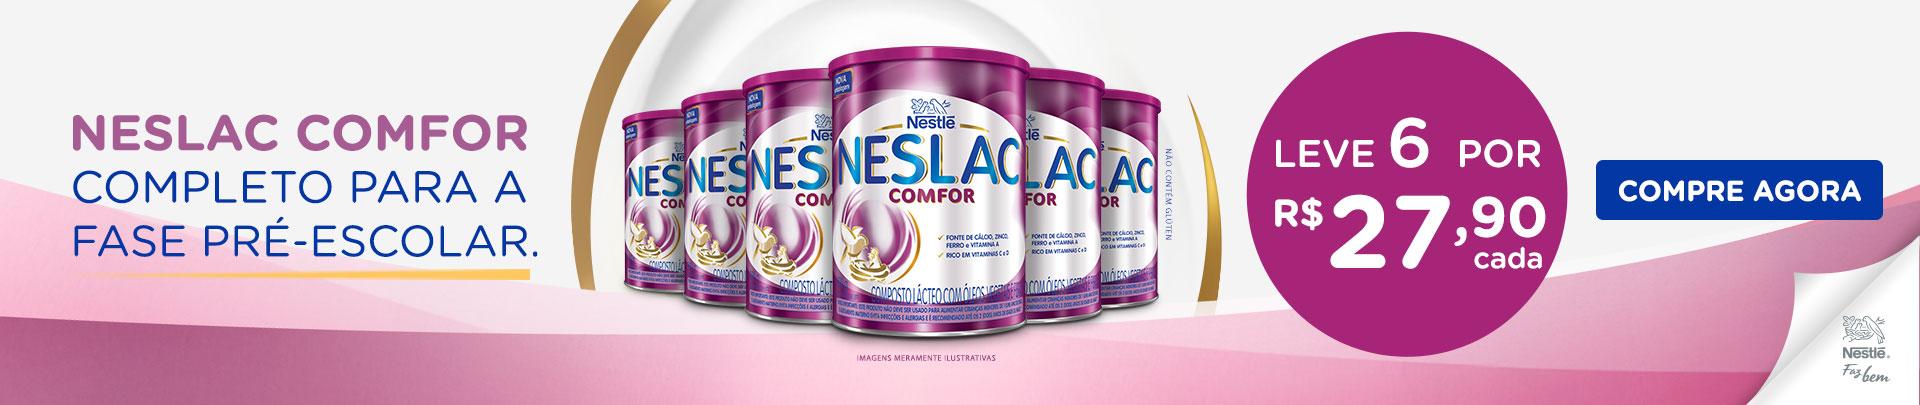 Neslac